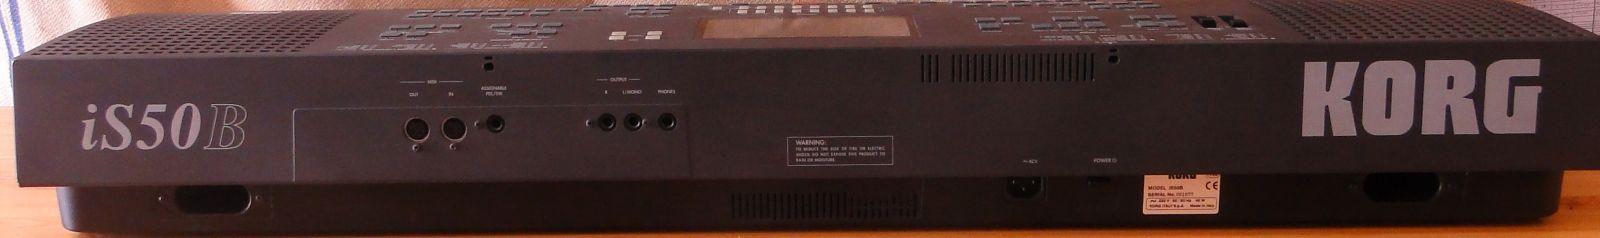 DSC06147.JPG (1600×238)